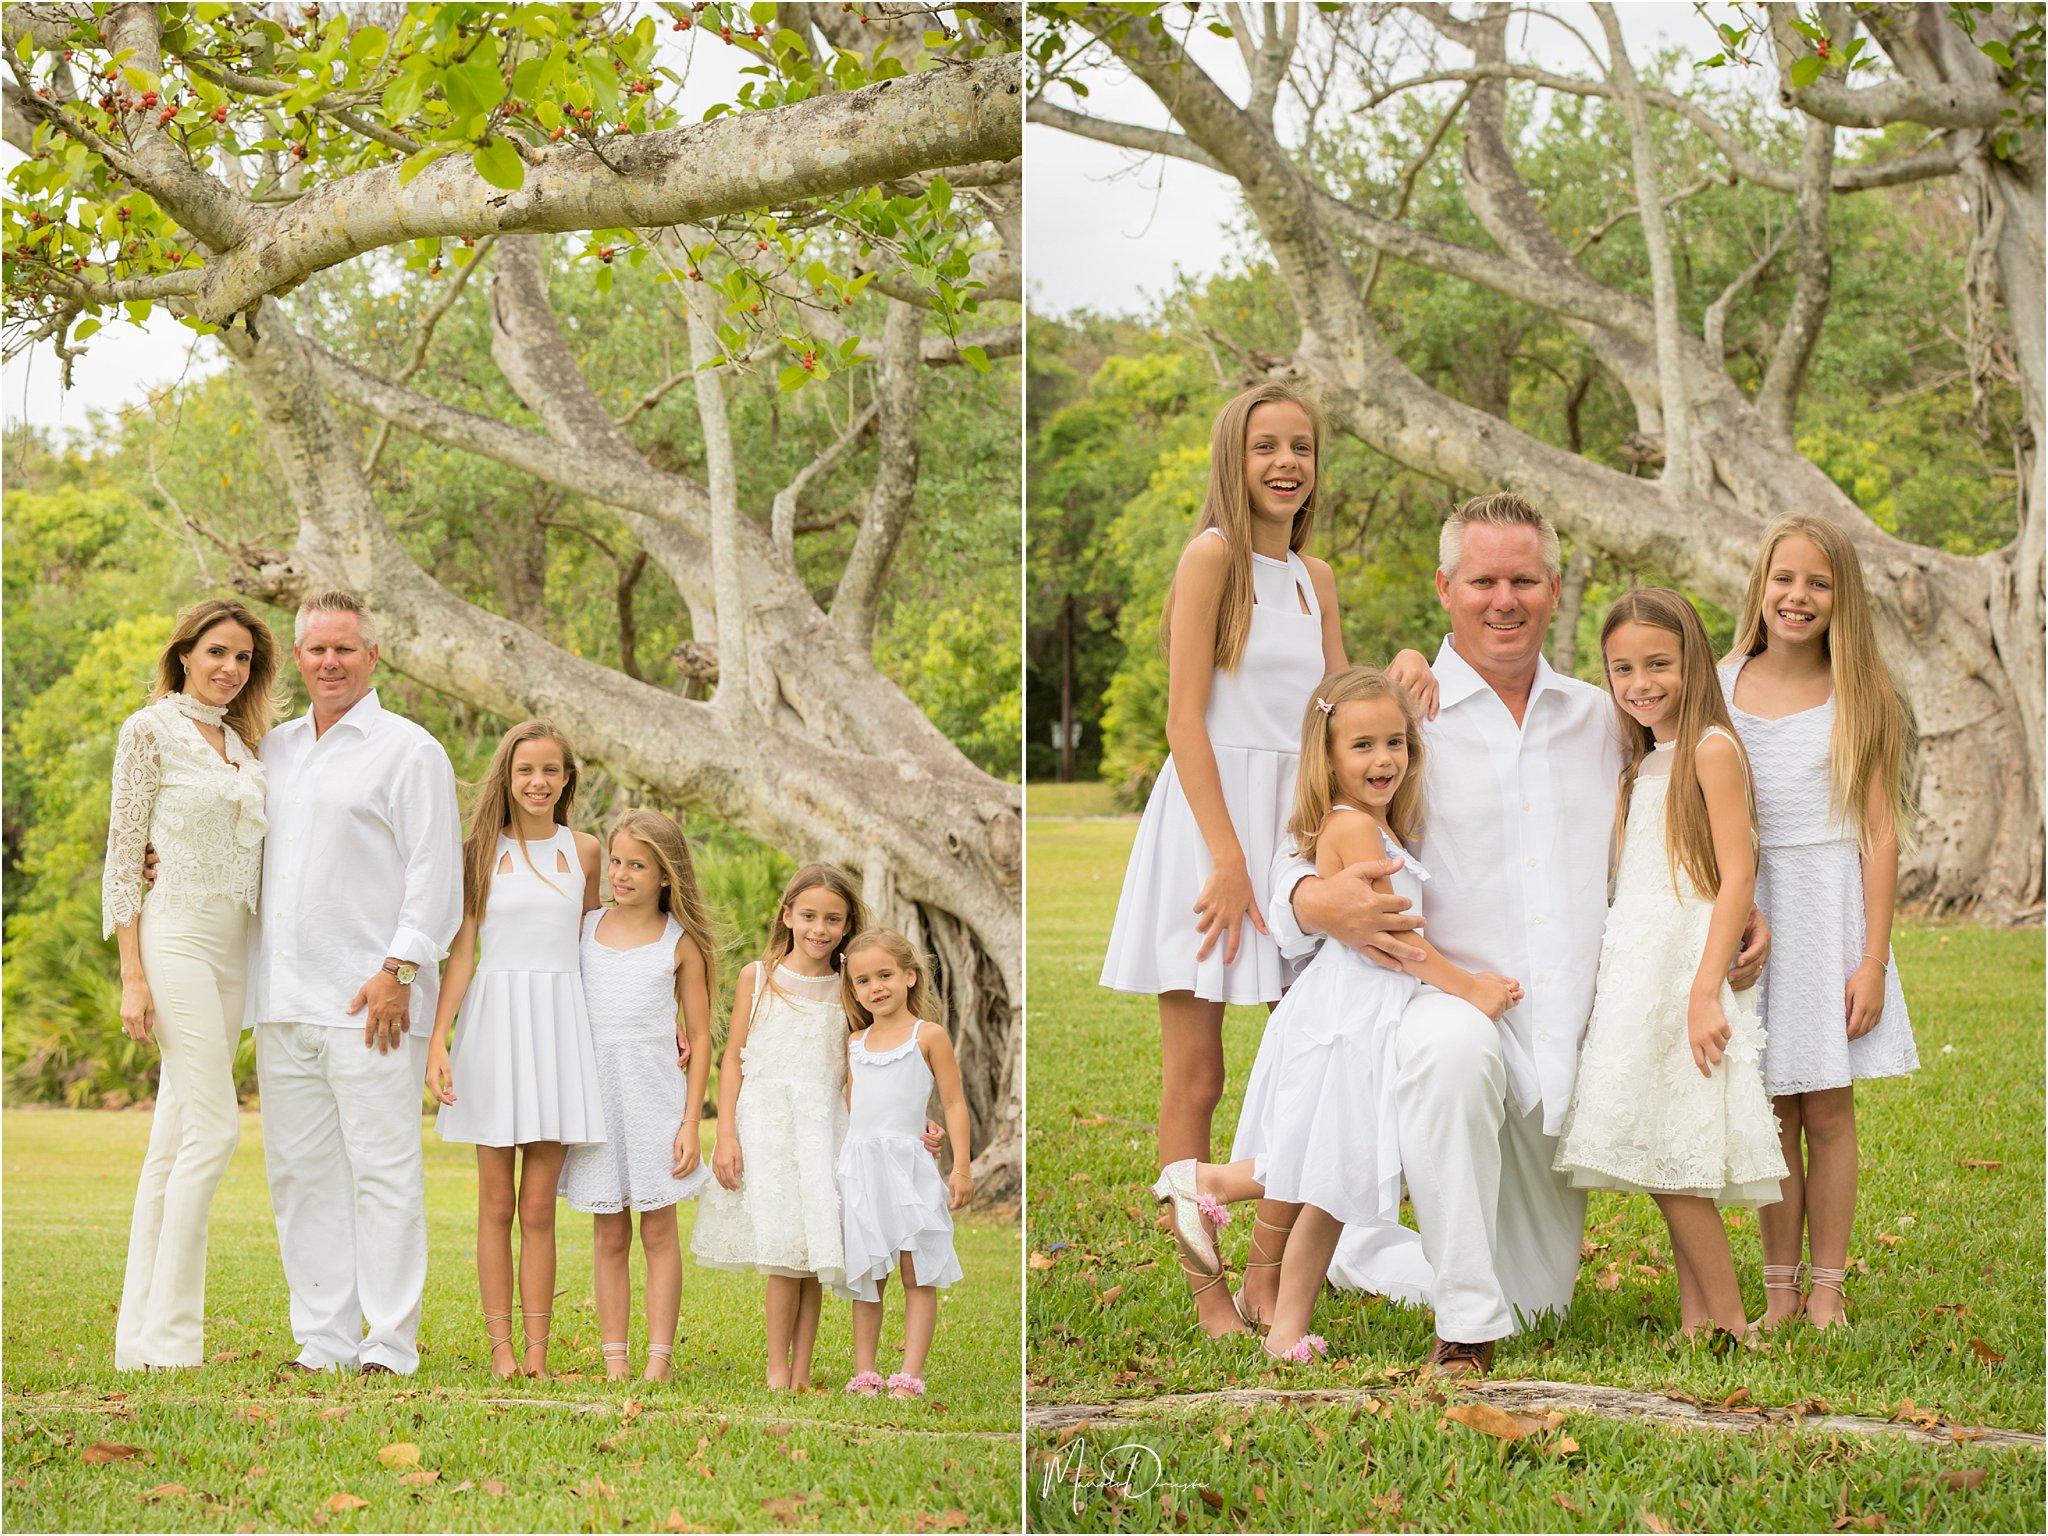 0561_ManoloDoreste_InFocusStudios_Wedding_Family_Photography_Miami_MiamiPhotographer.jpg